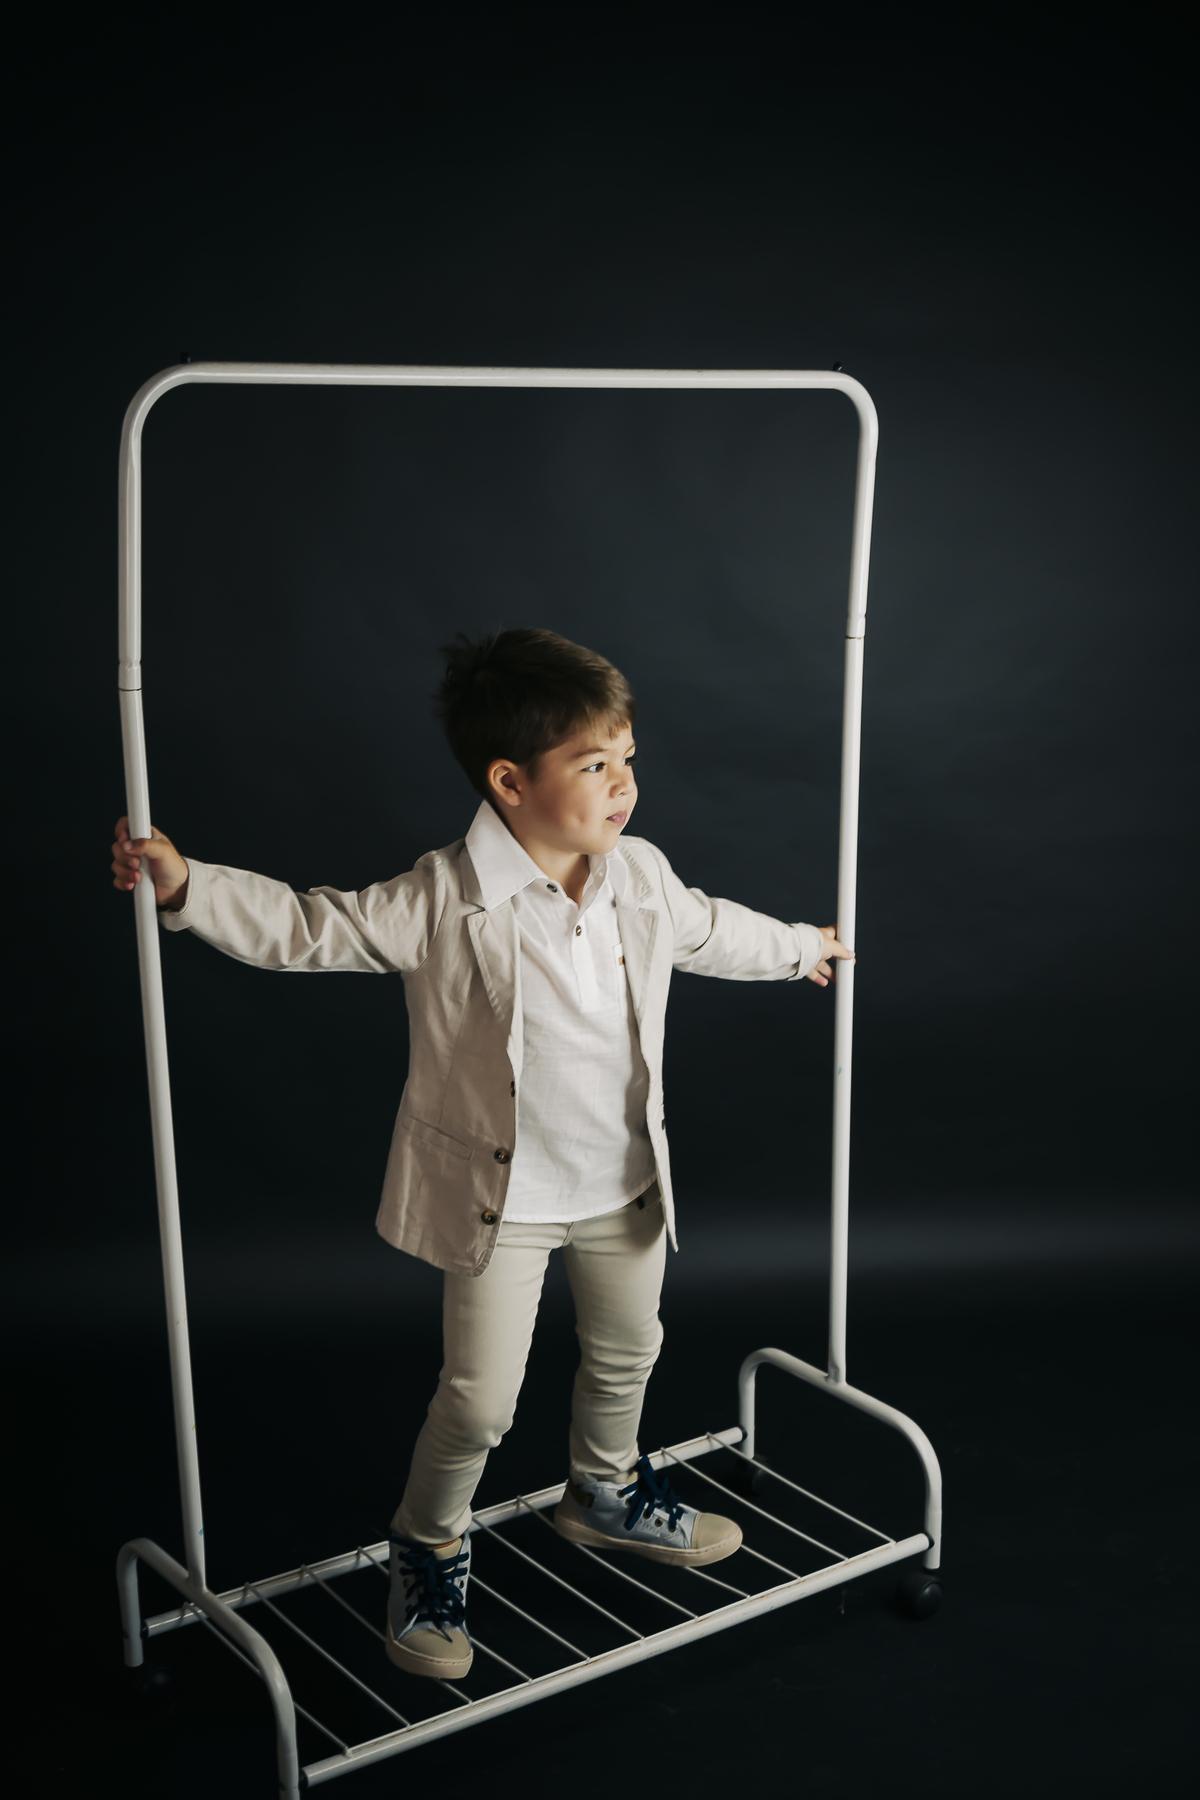 Ensaio infantil menino em estúdio Brasilia, fundo preto